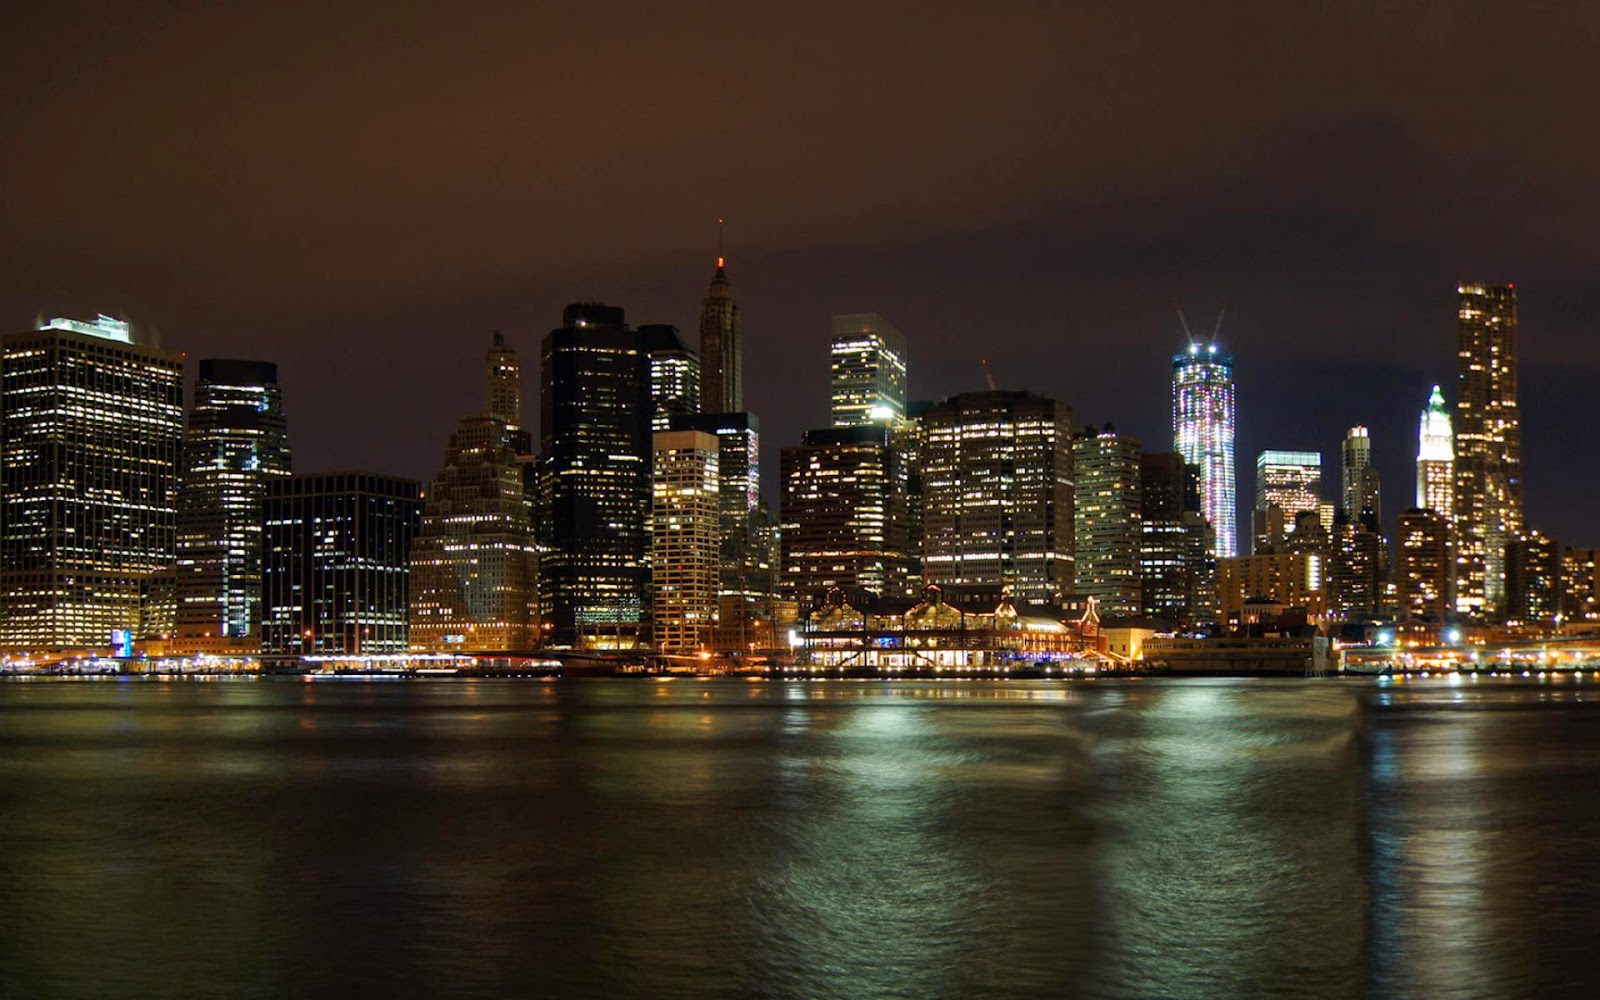 New York Night City Wallpaper